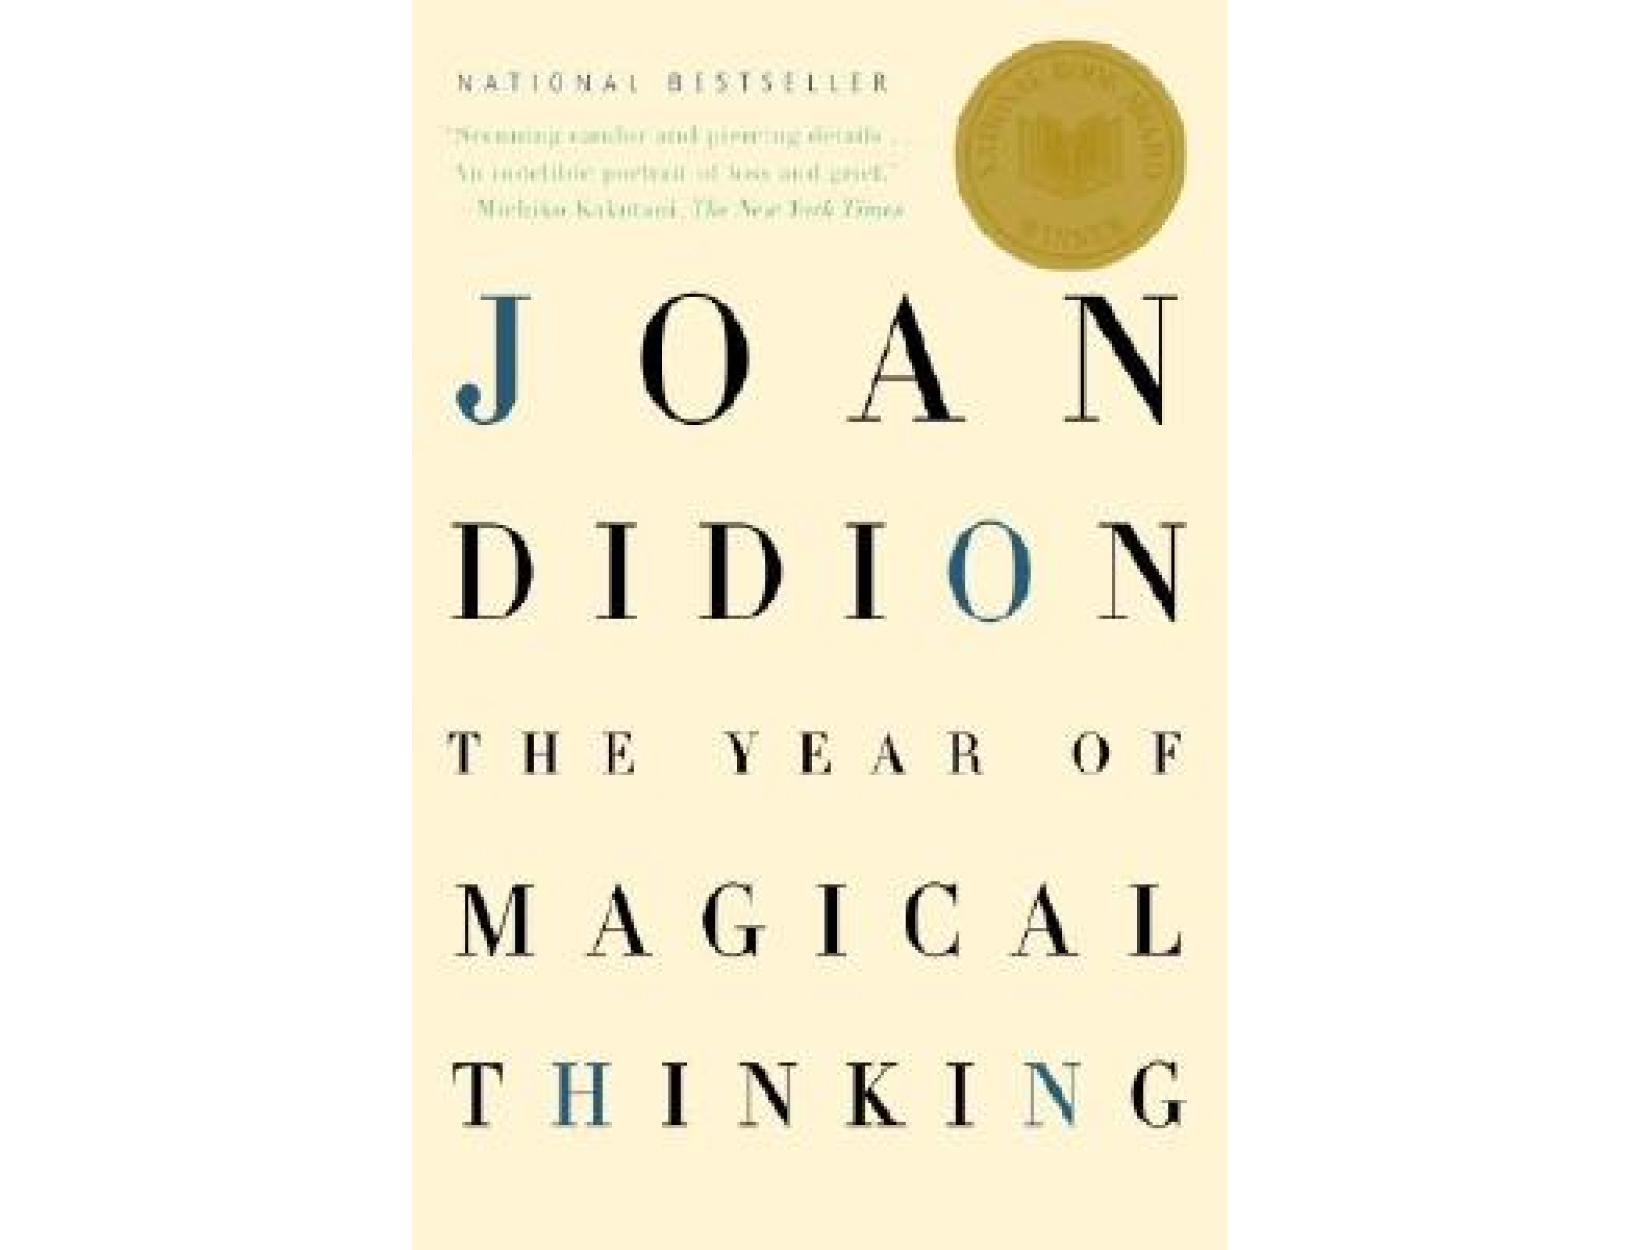 <em>The Year of Magical Thinking</em> by Joan Didion (with a side of <em>Wonder Boys</em>)